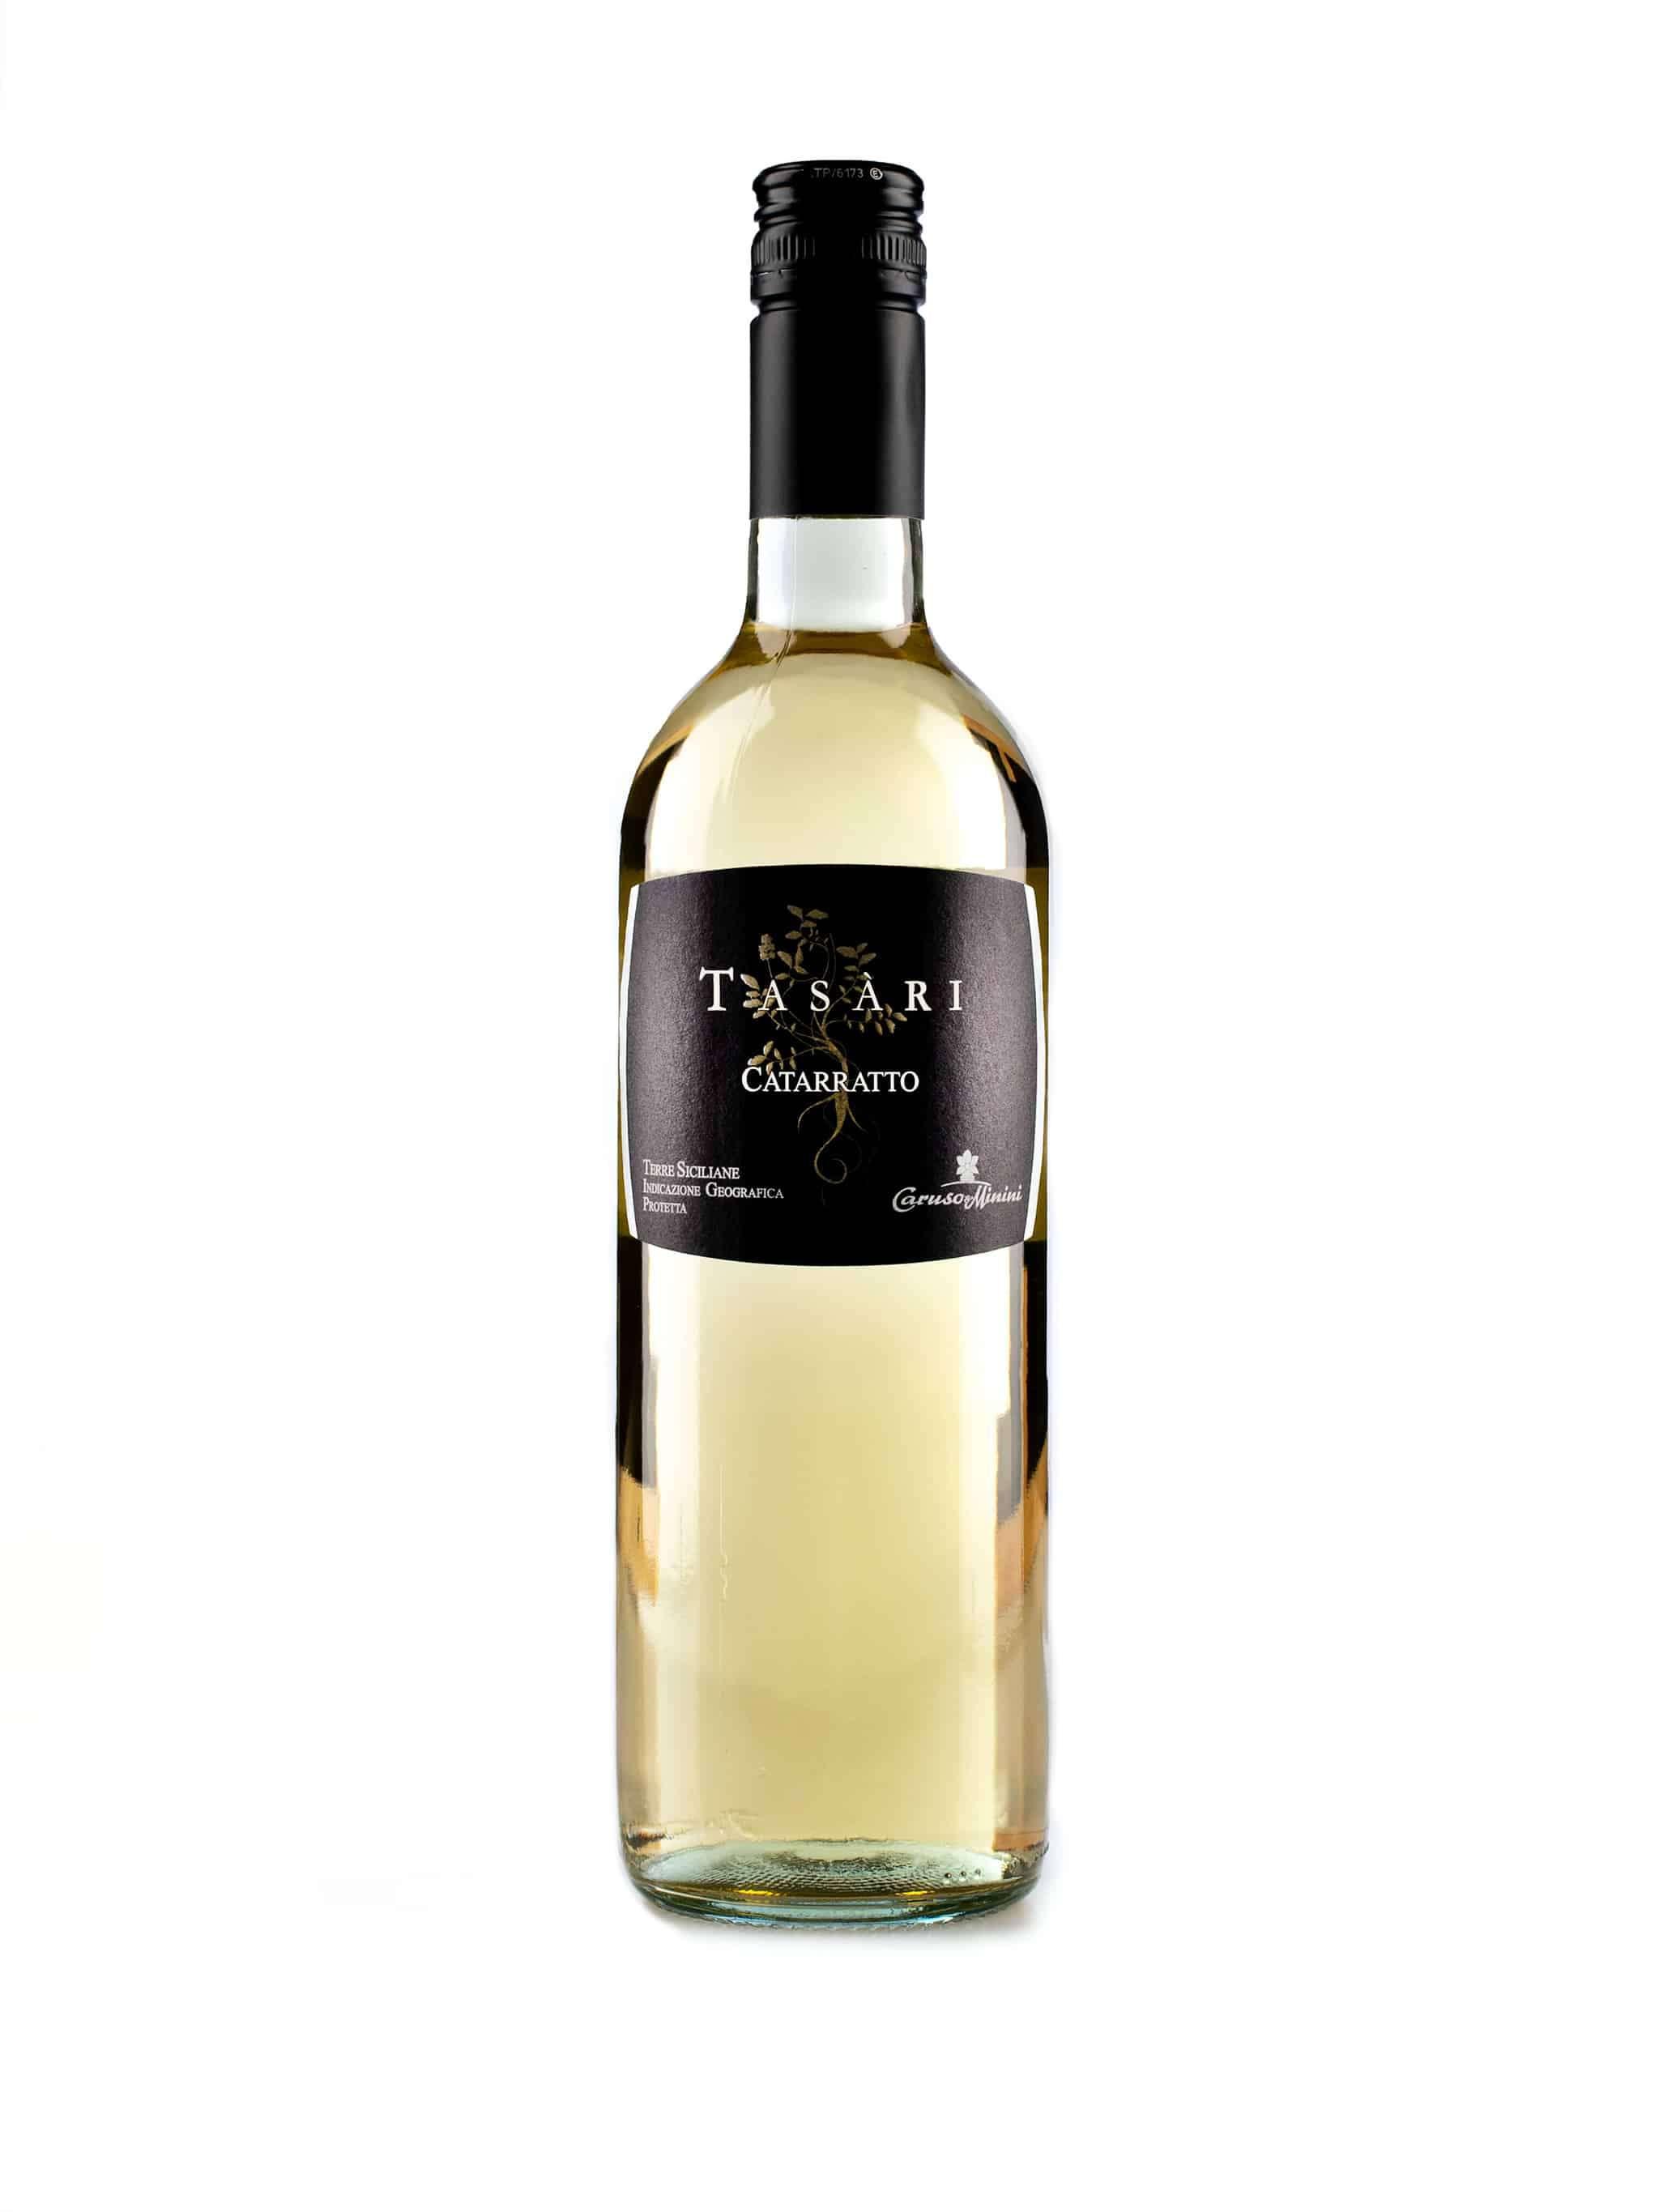 Italiaanse witte wijn van wijndomein Caruso & Minini: Catarratto 'Tasari'